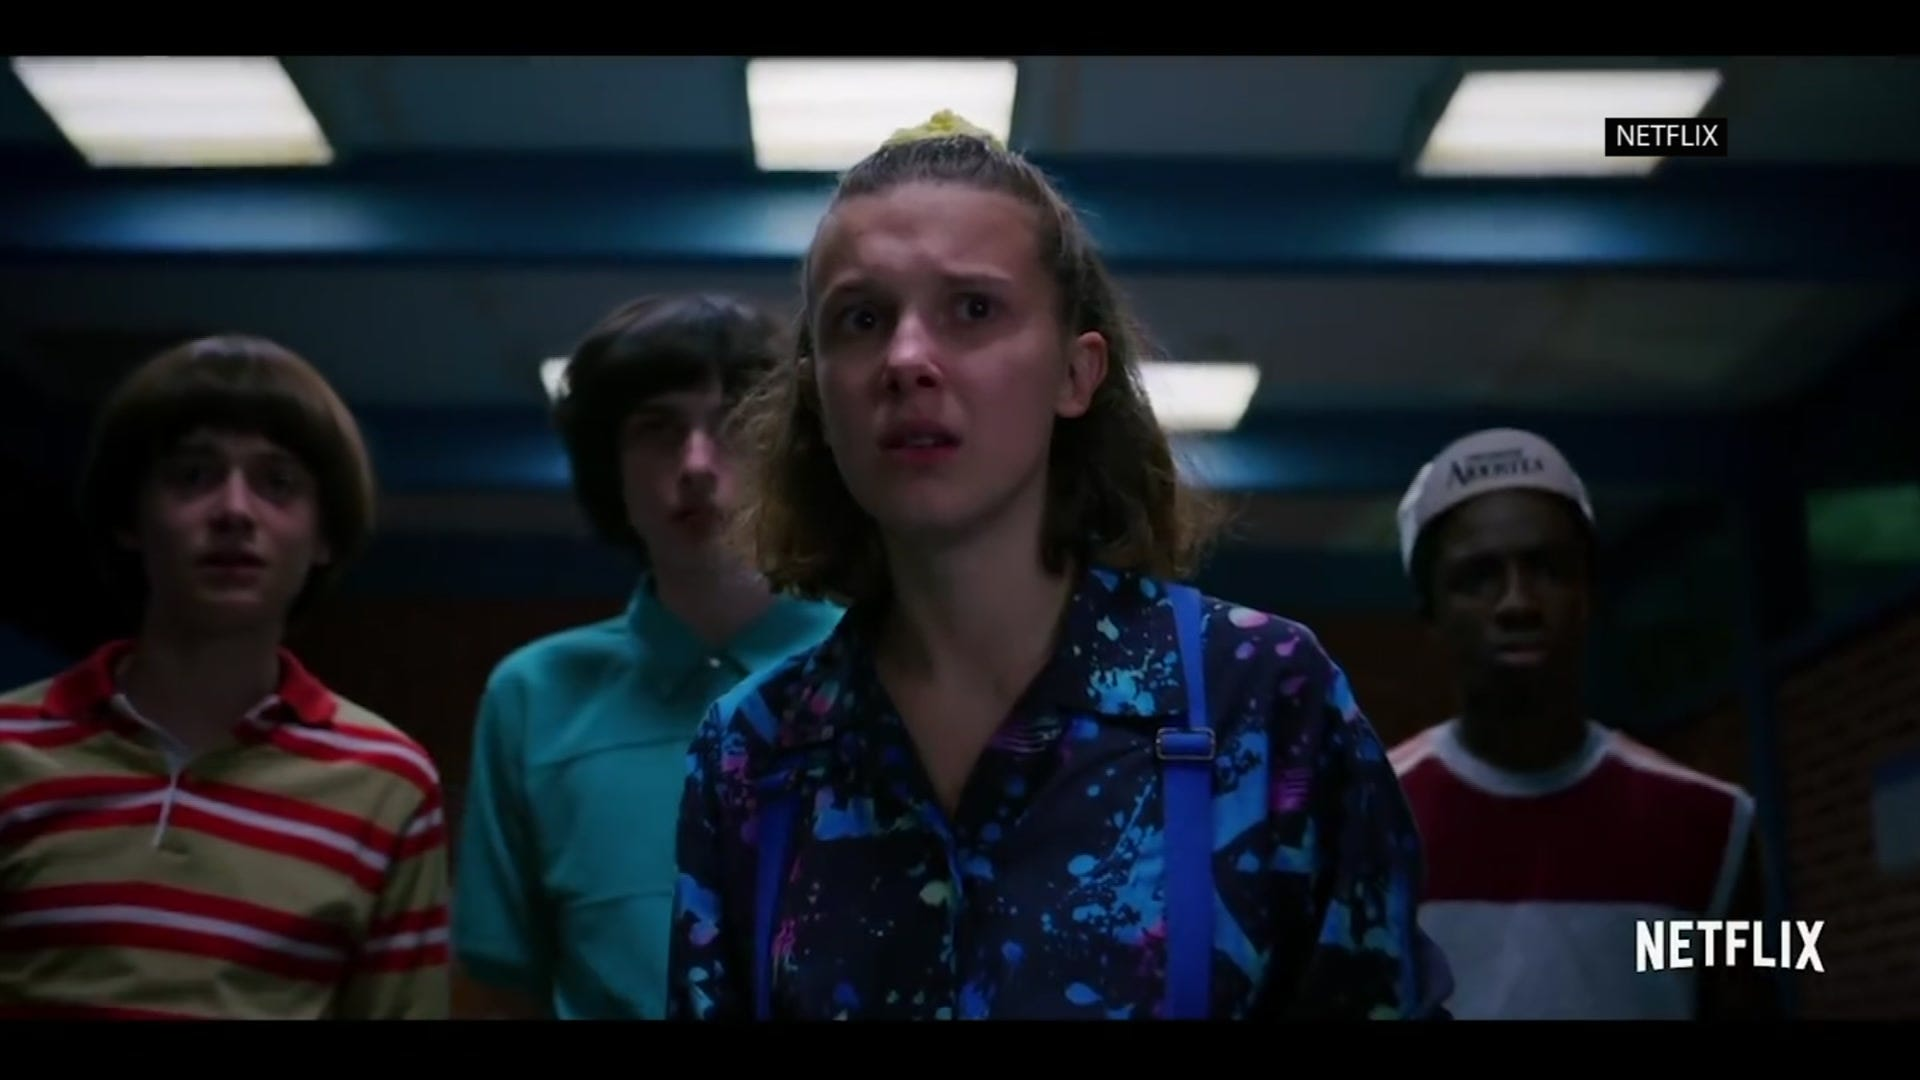 'Stranger Things' cast promises scary, mature new season